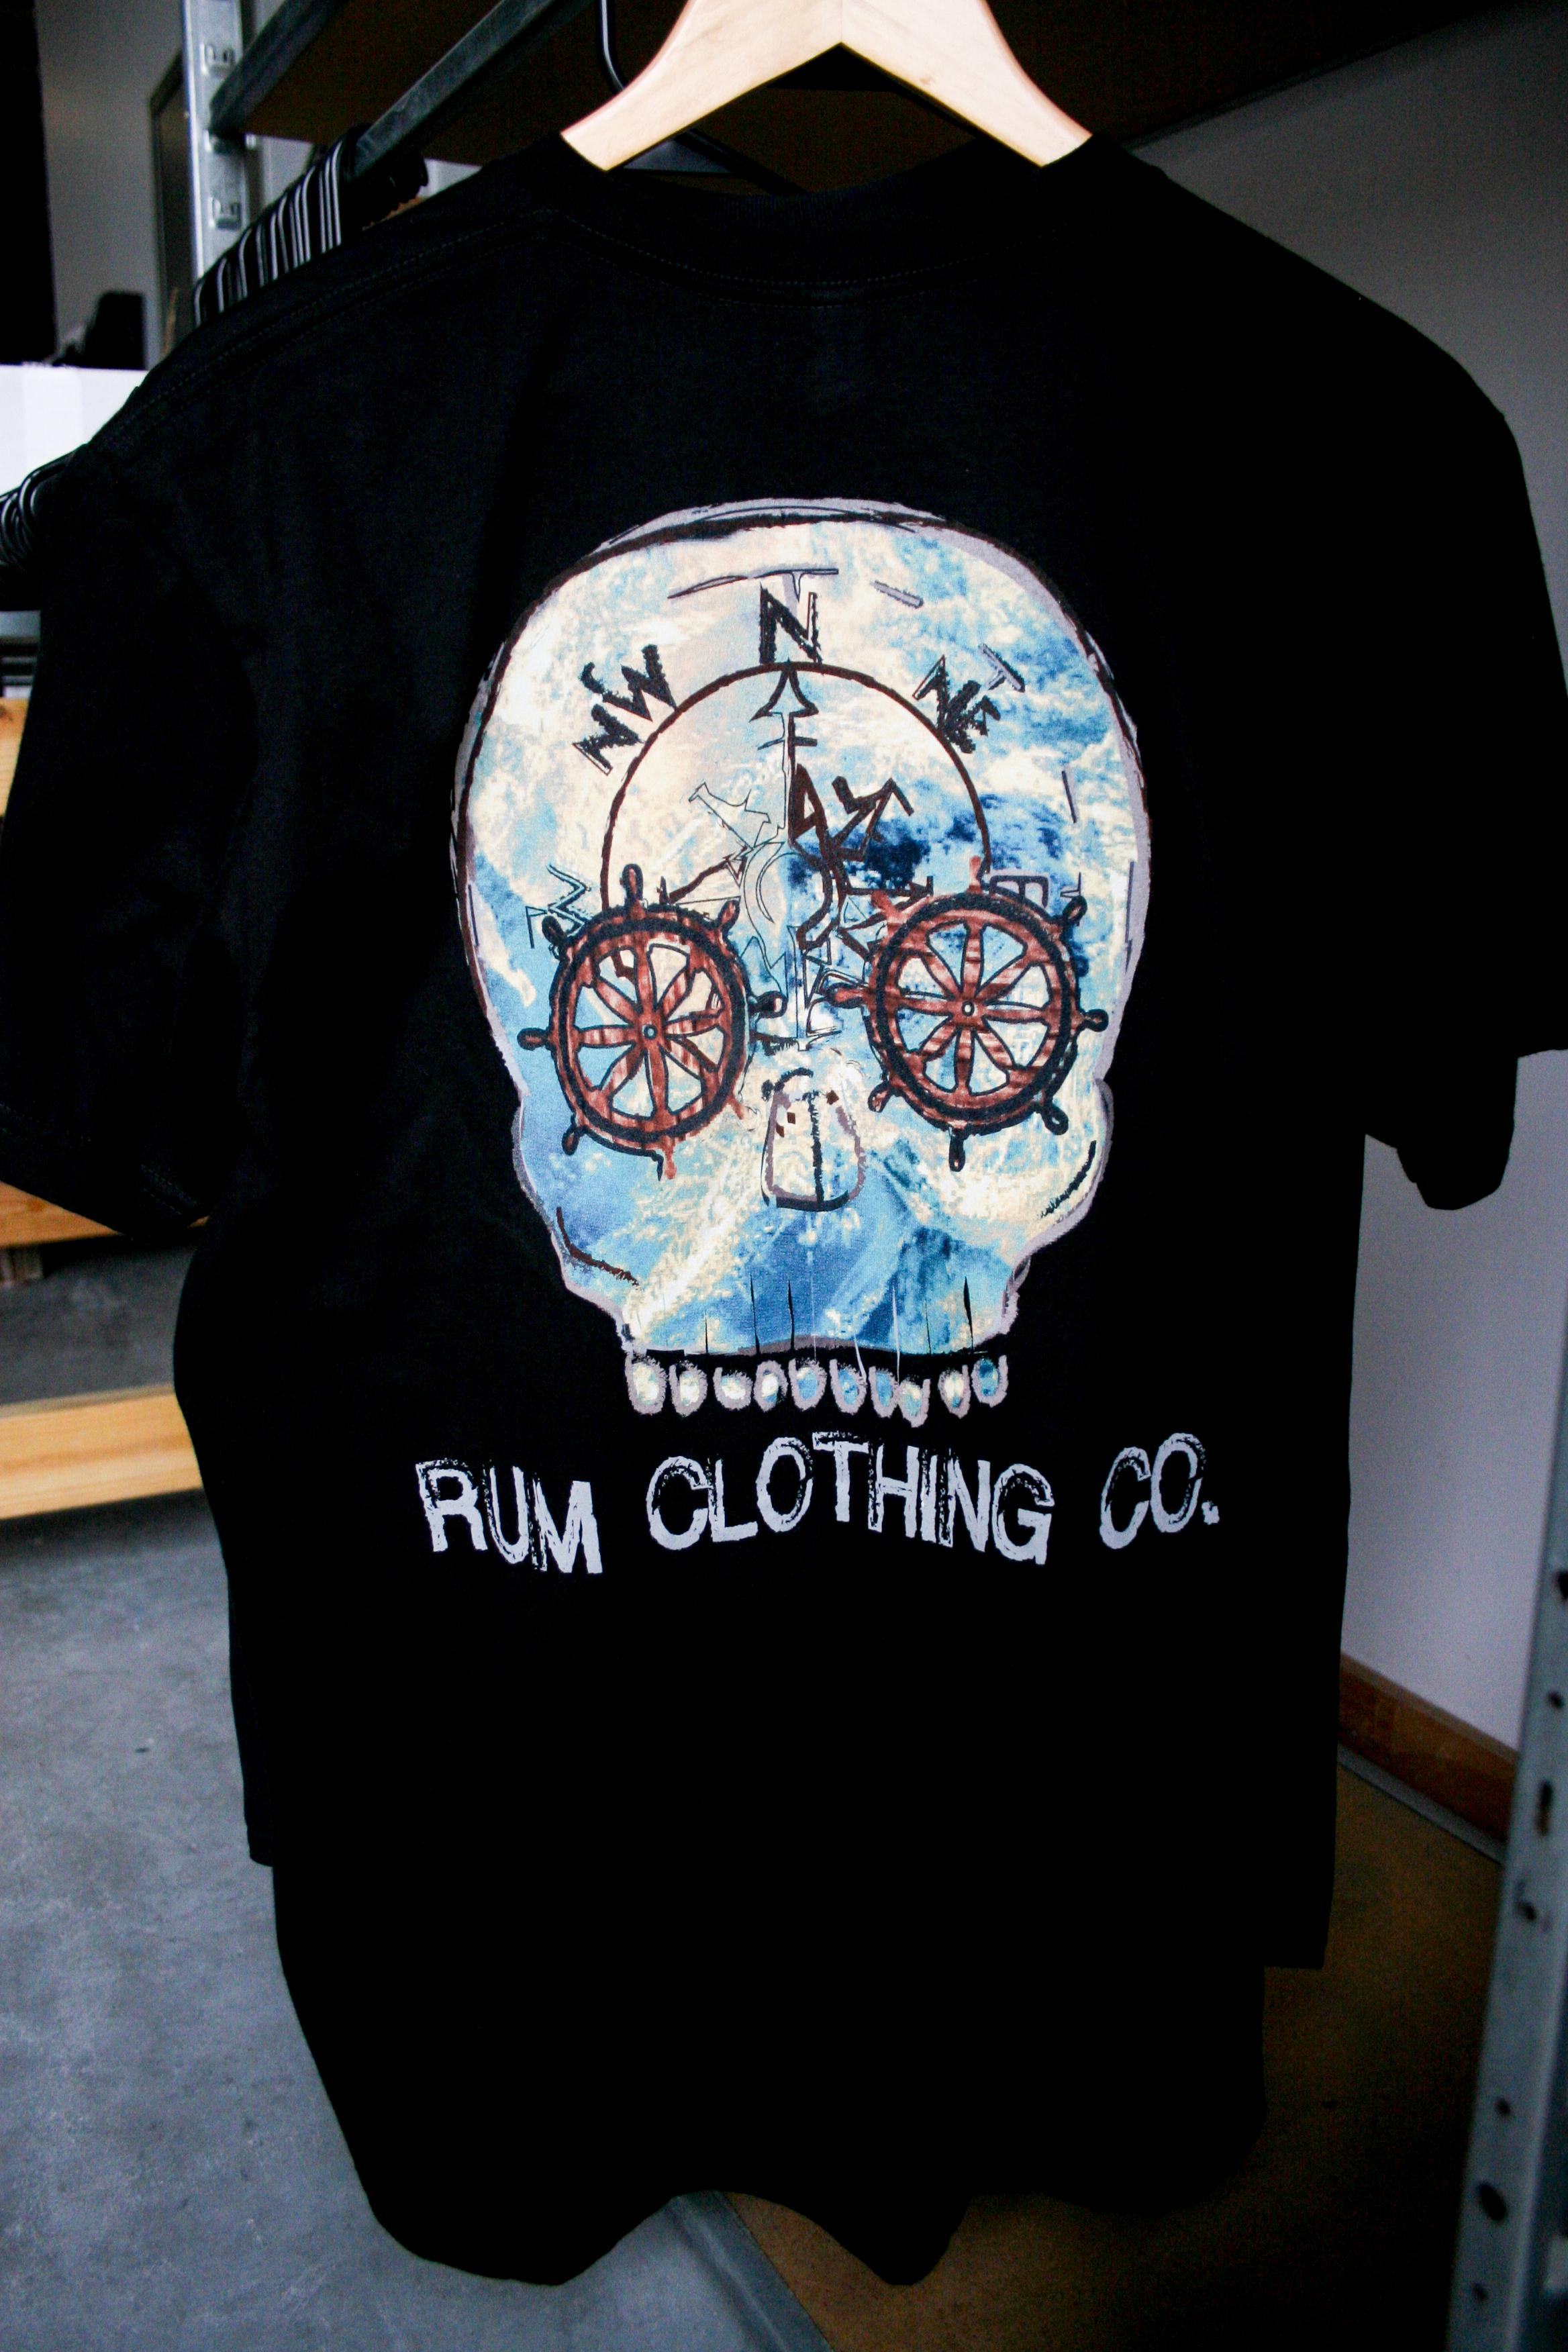 Rum Clothing Co. | Premium Customized T-Shirt | Impressionz Printing